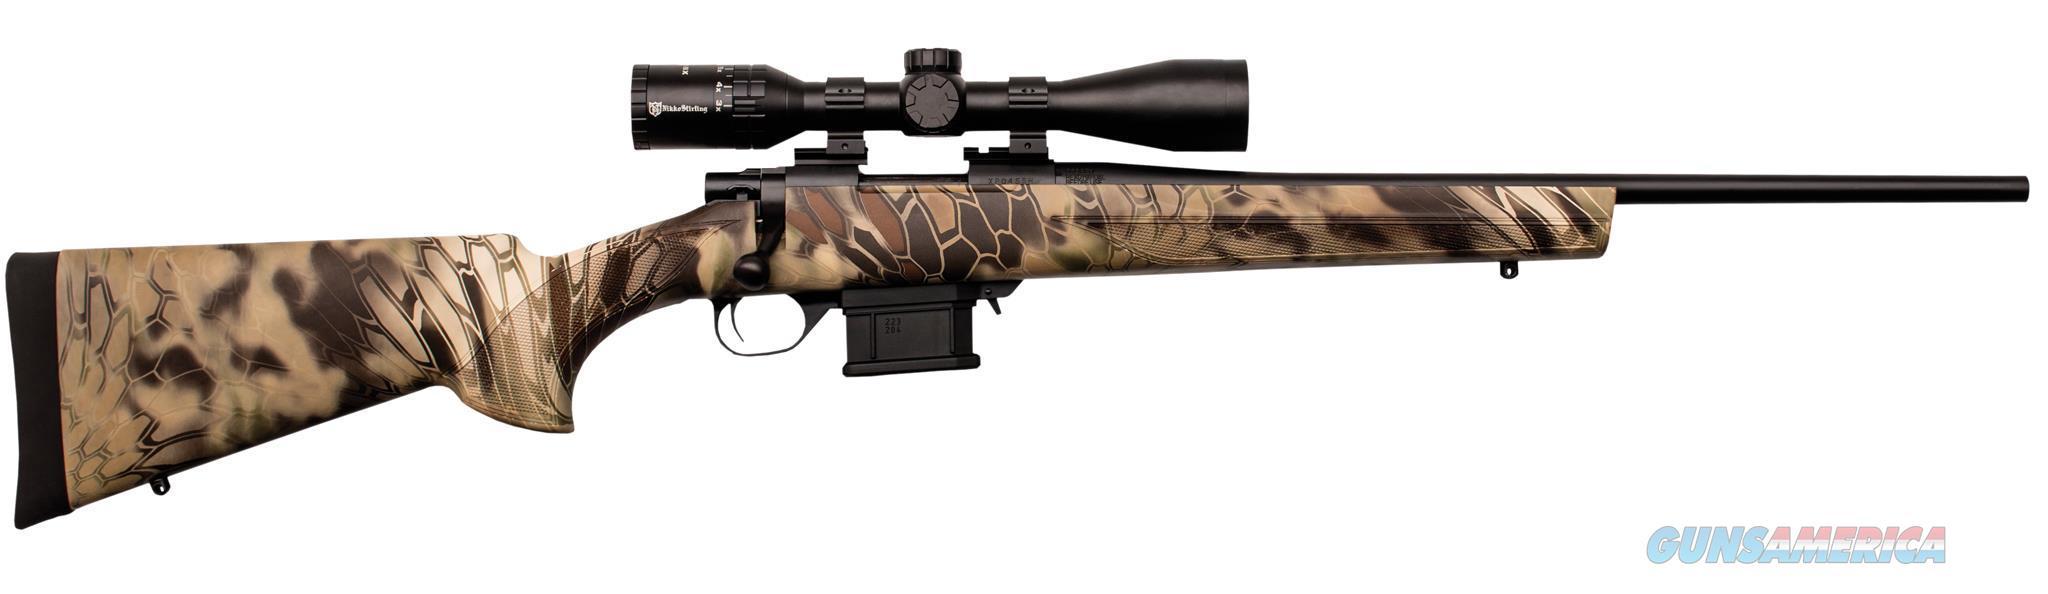 "Howa Hmp60202khc Mini Action Combo Package Bolt 223 Remington 22"" 10+1 Synthetic Kryptek Highlander Stk Blued HMP60202KHC  Guns > Rifles > H Misc Rifles"